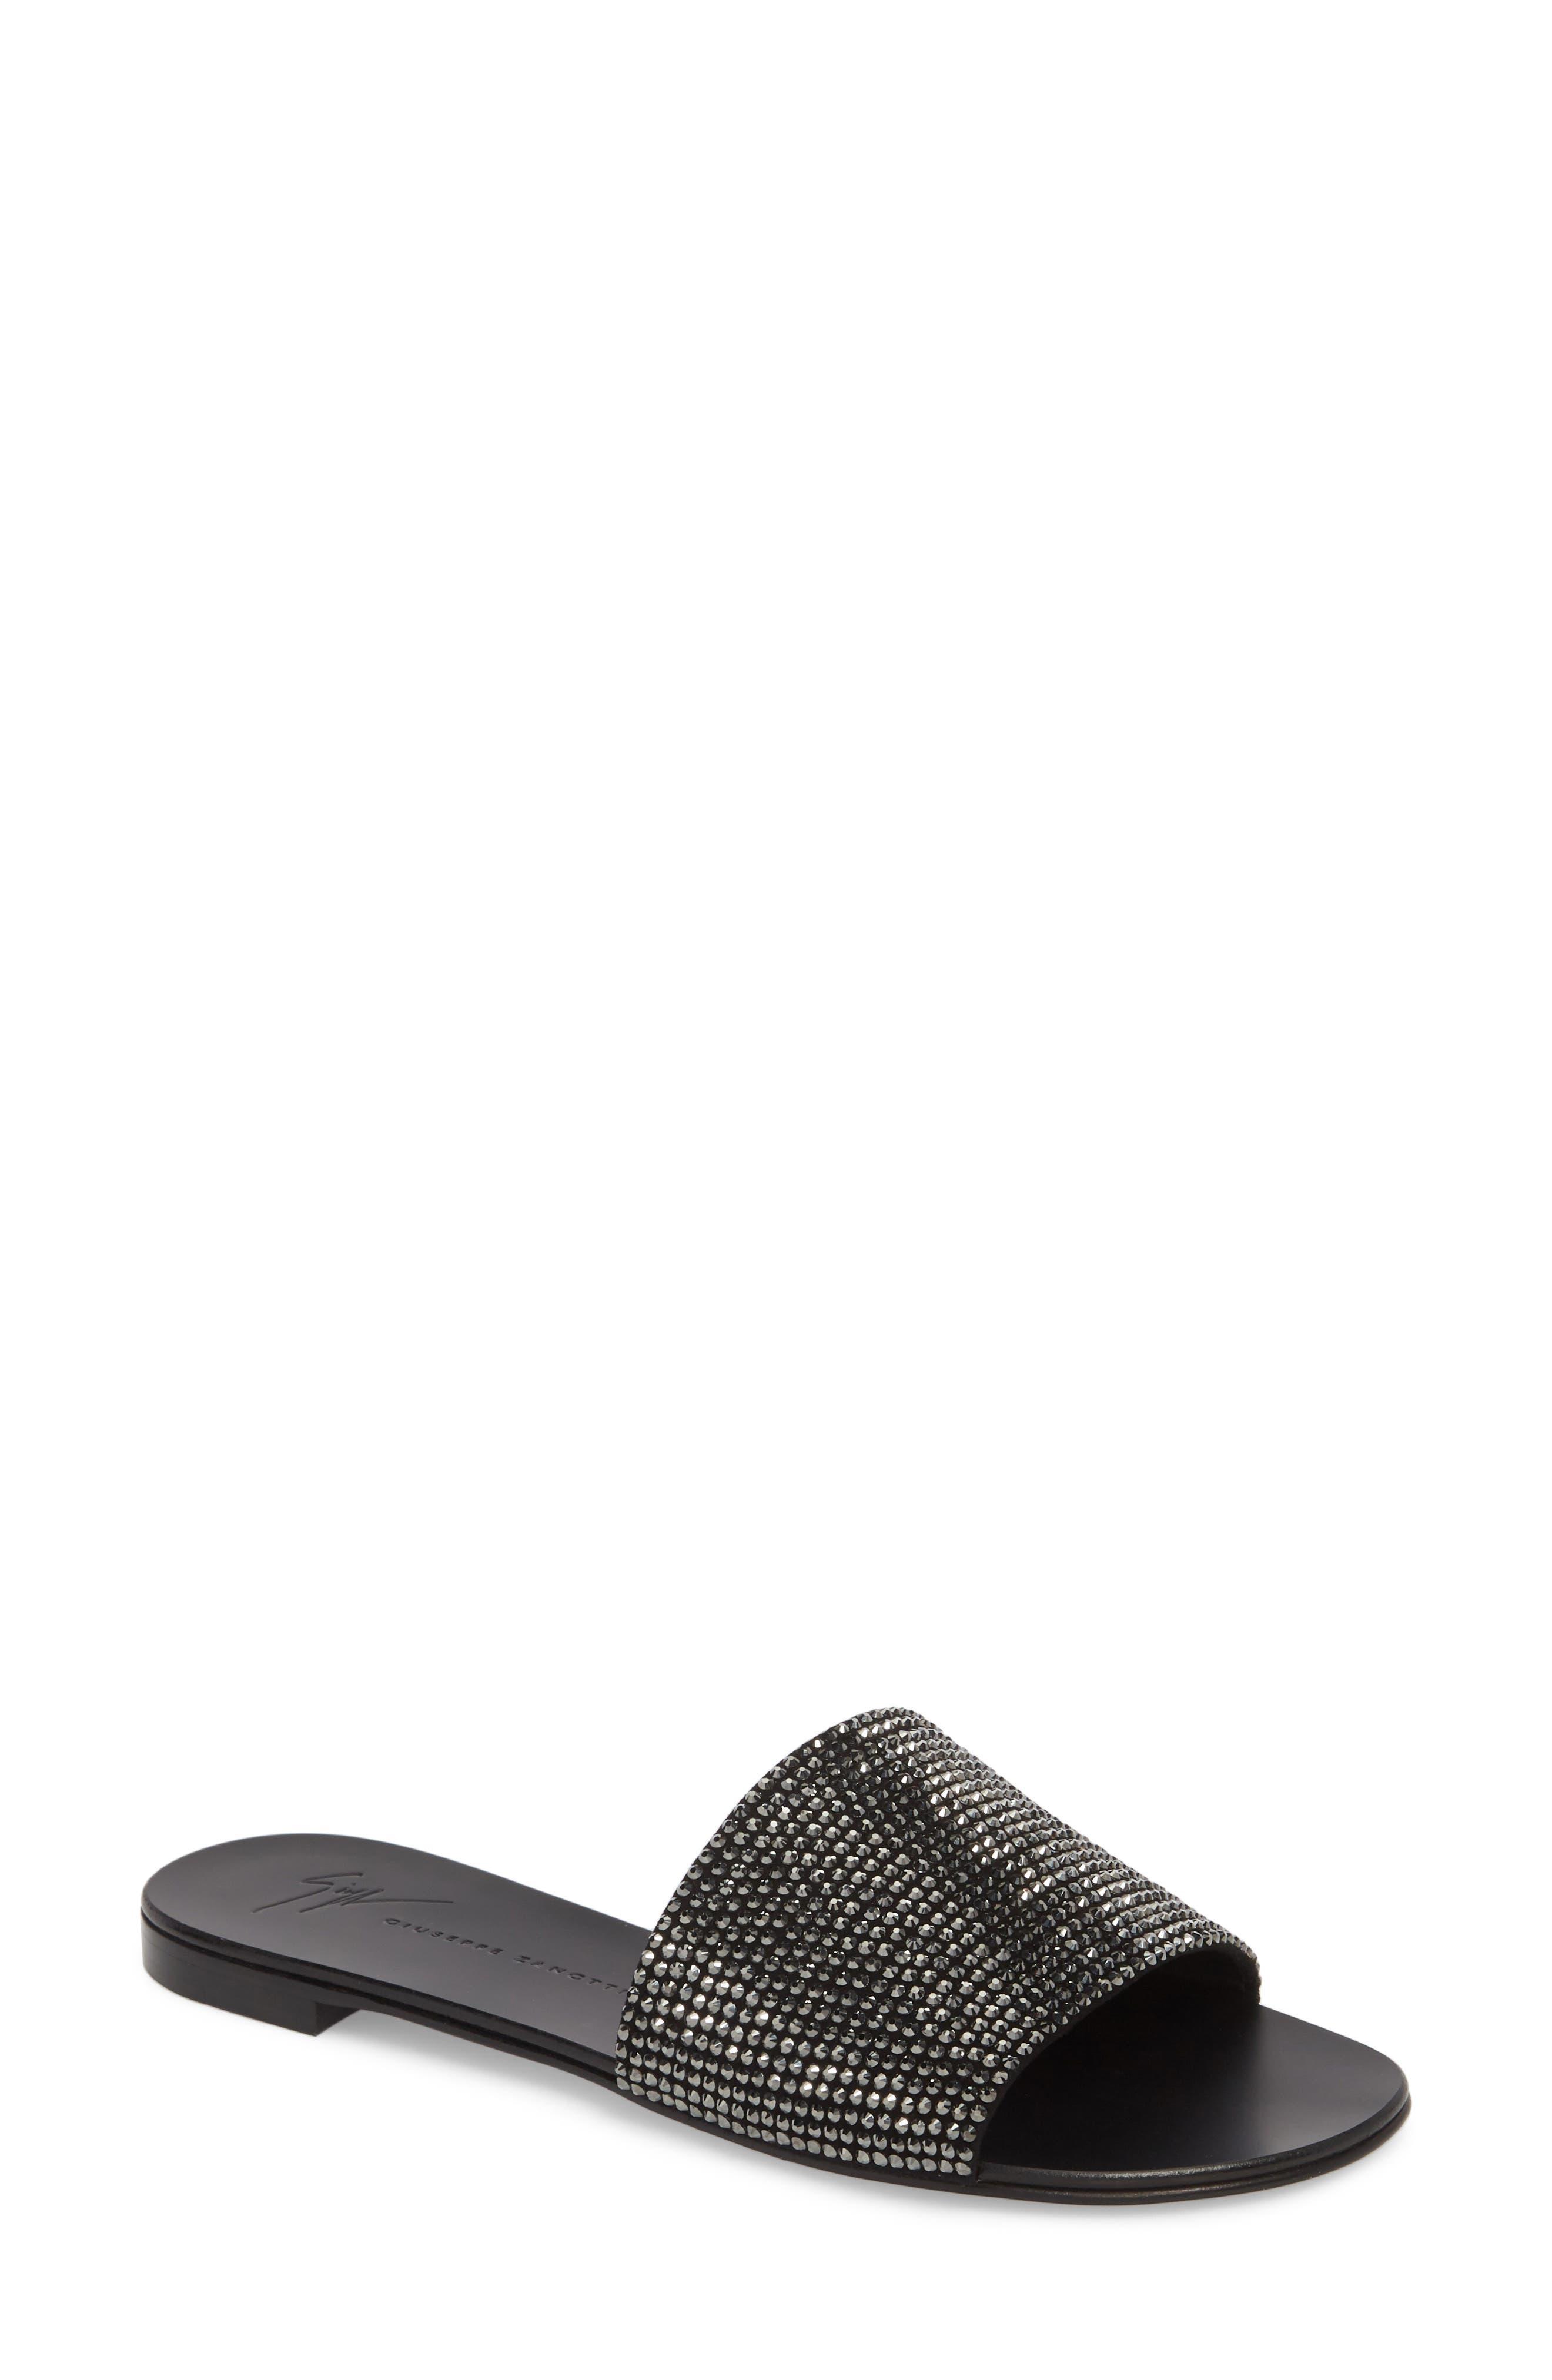 Main Image - Giuseppe Zanotti Crystal Embellished Slide Sandal (Women)